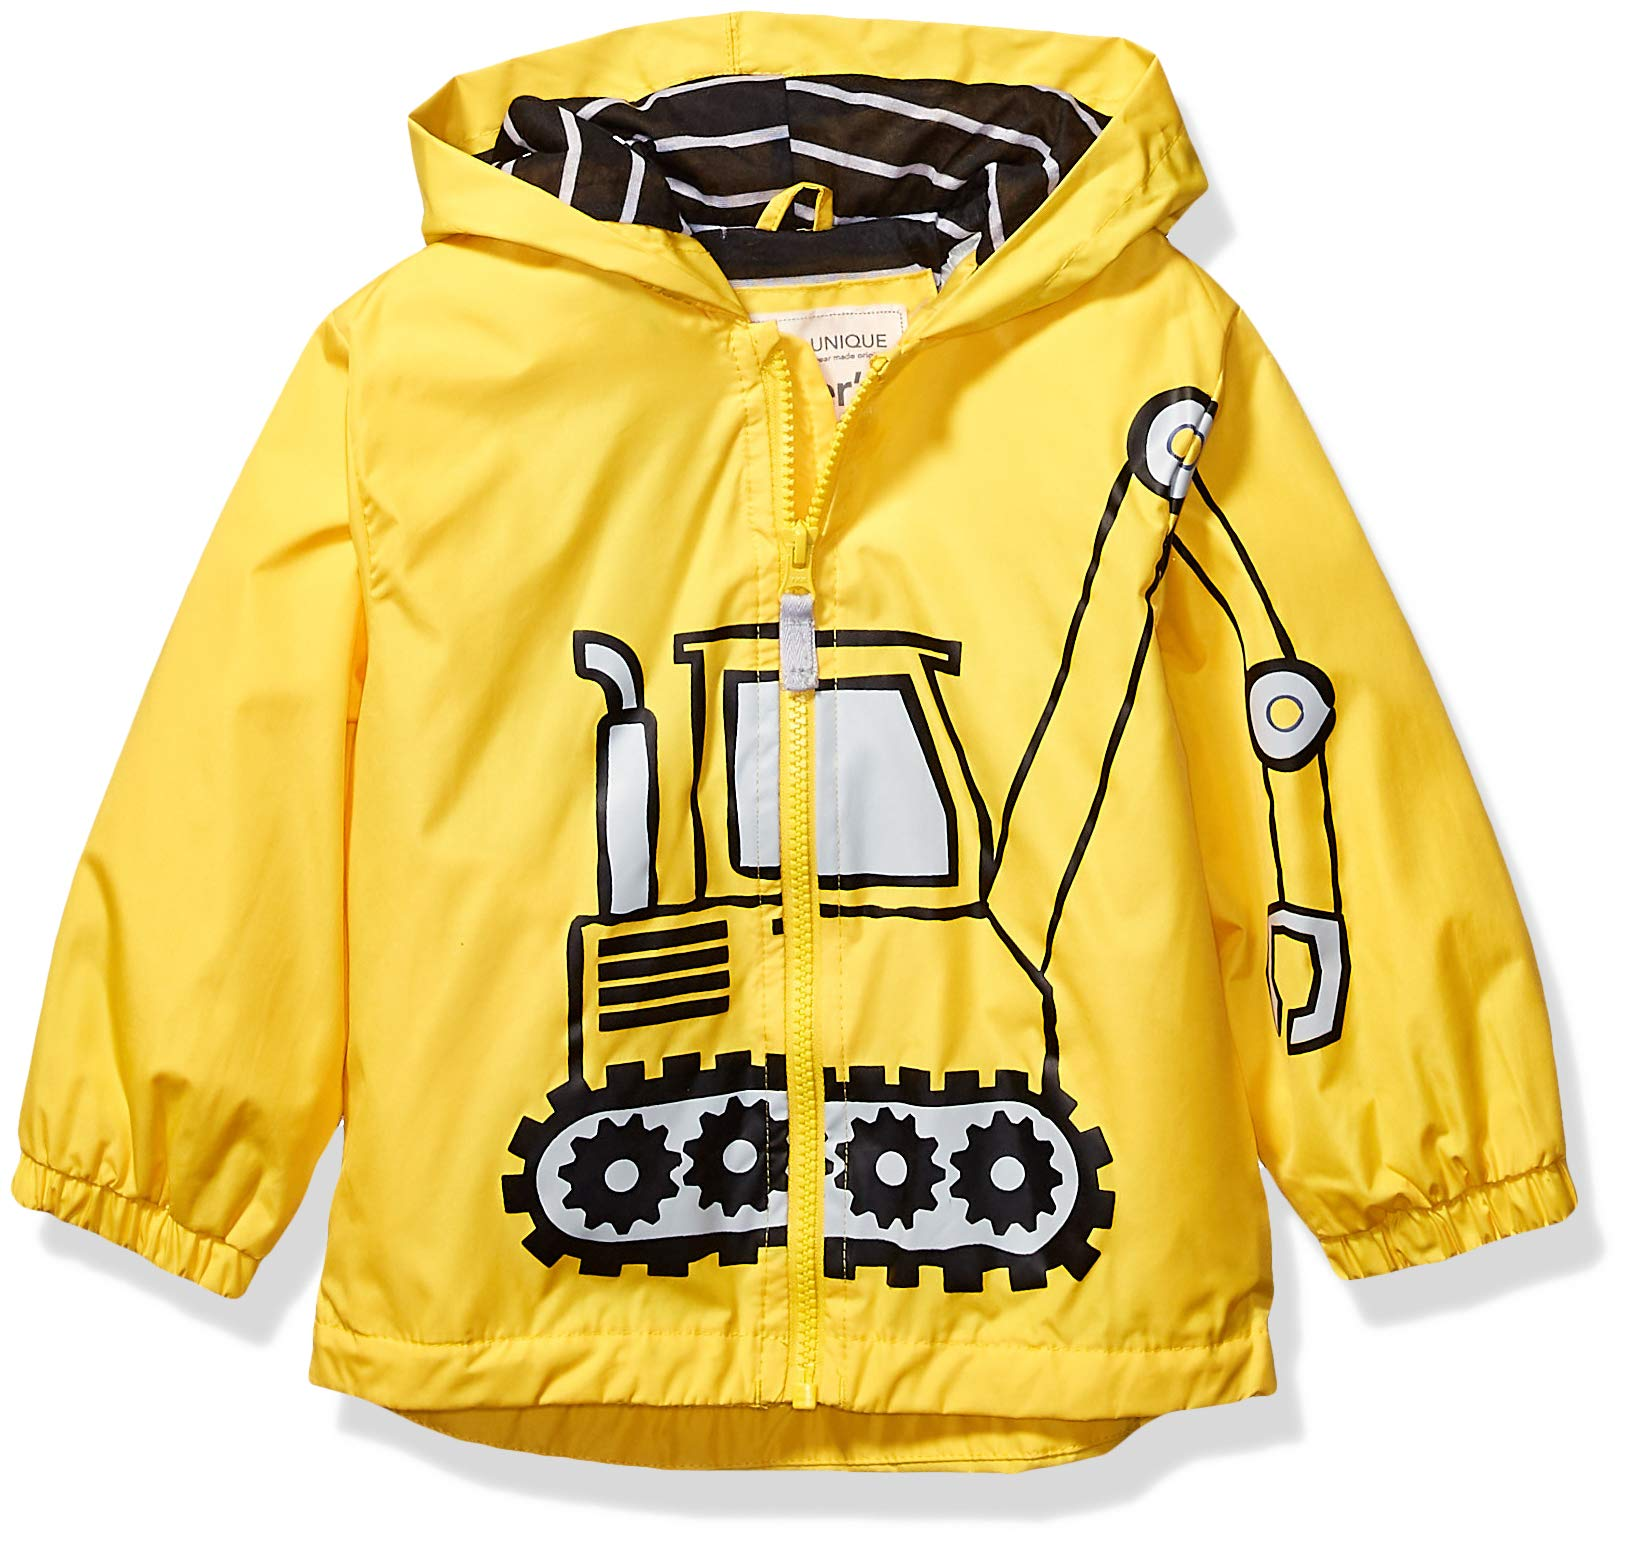 Carter's Boys' Toddler Favorite Rainslicker Rain Jacket, Yellow Tractor, 2T by Carter's